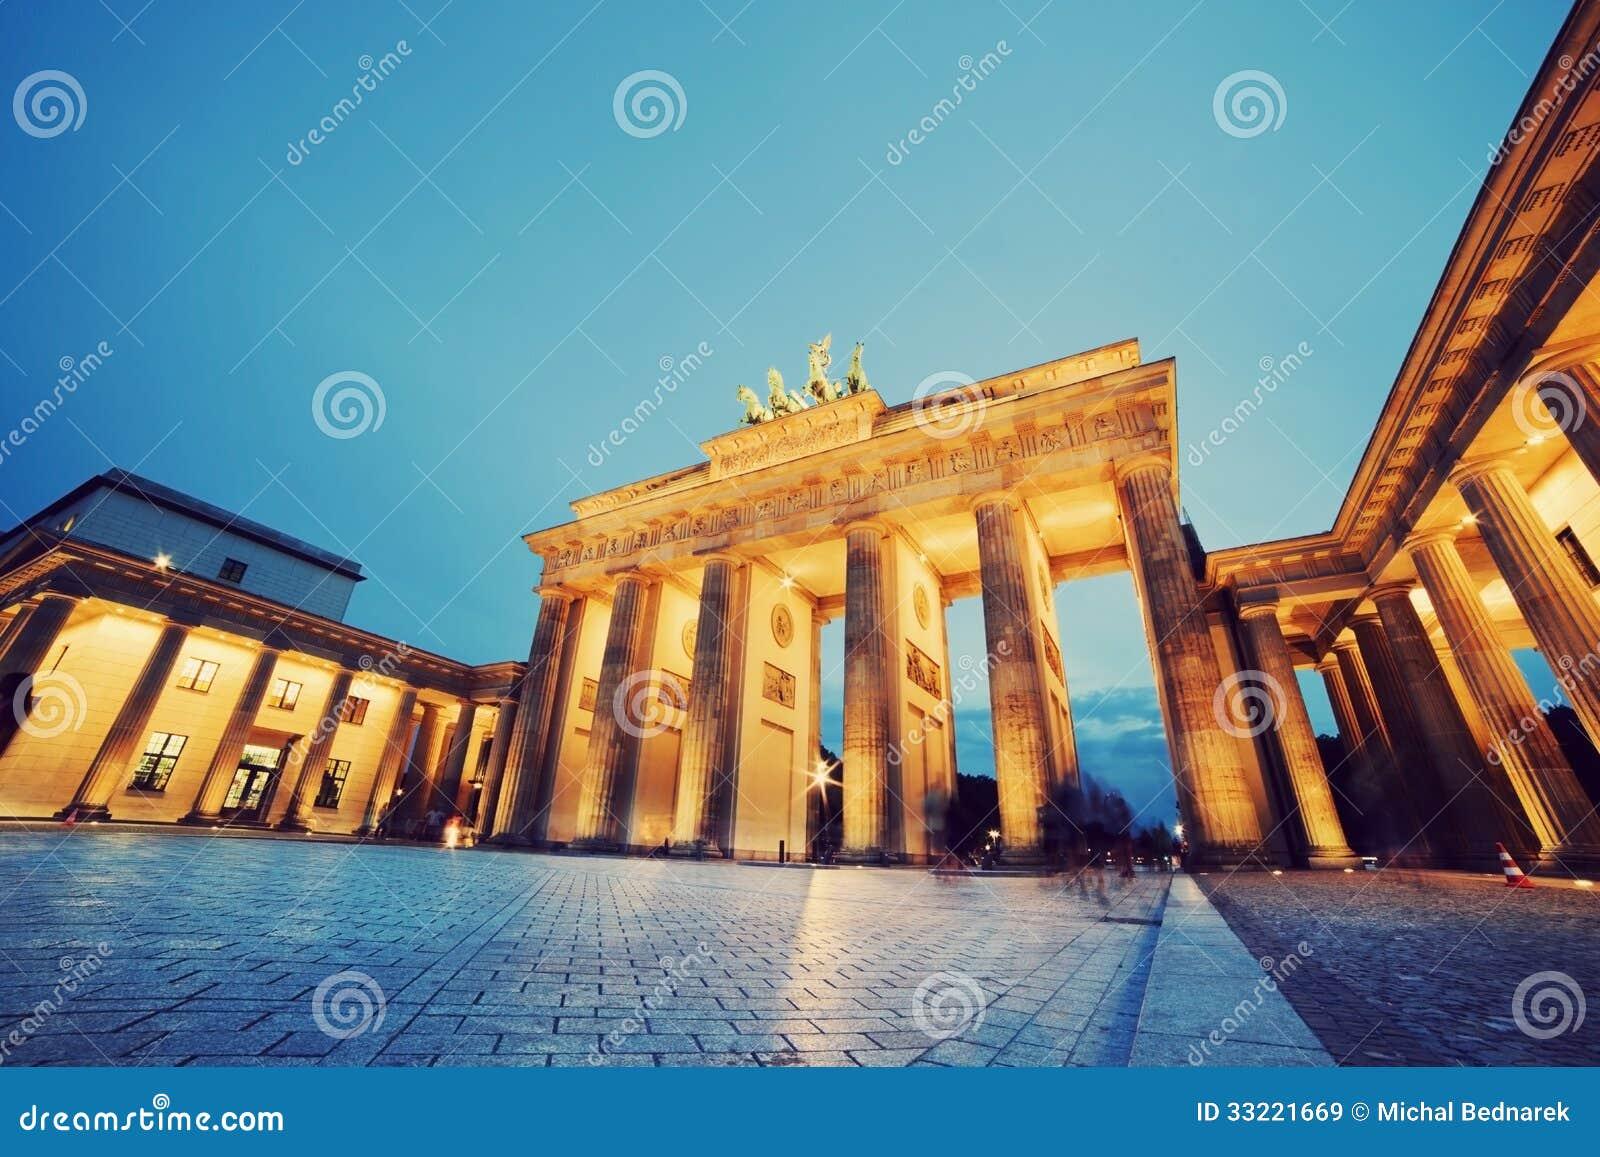 Porta de Brandemburgo, Berlim, Alemanha